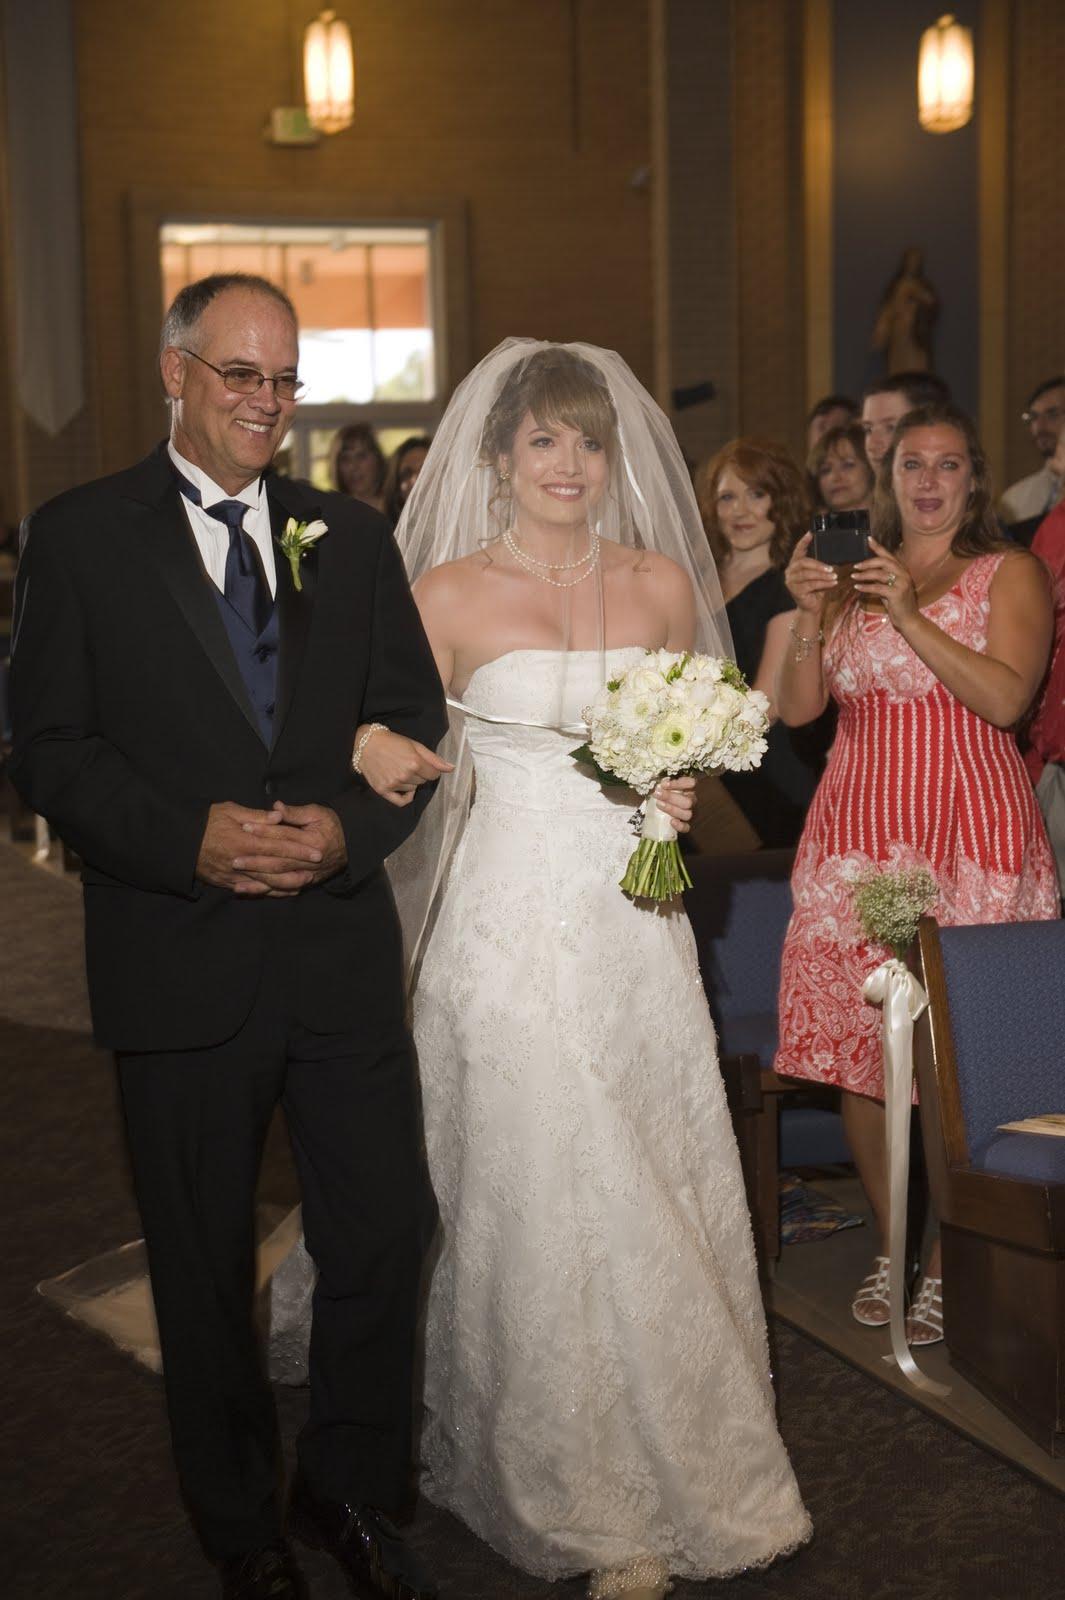 kerri metcalf mua kristin amp matt maher wedding 91010